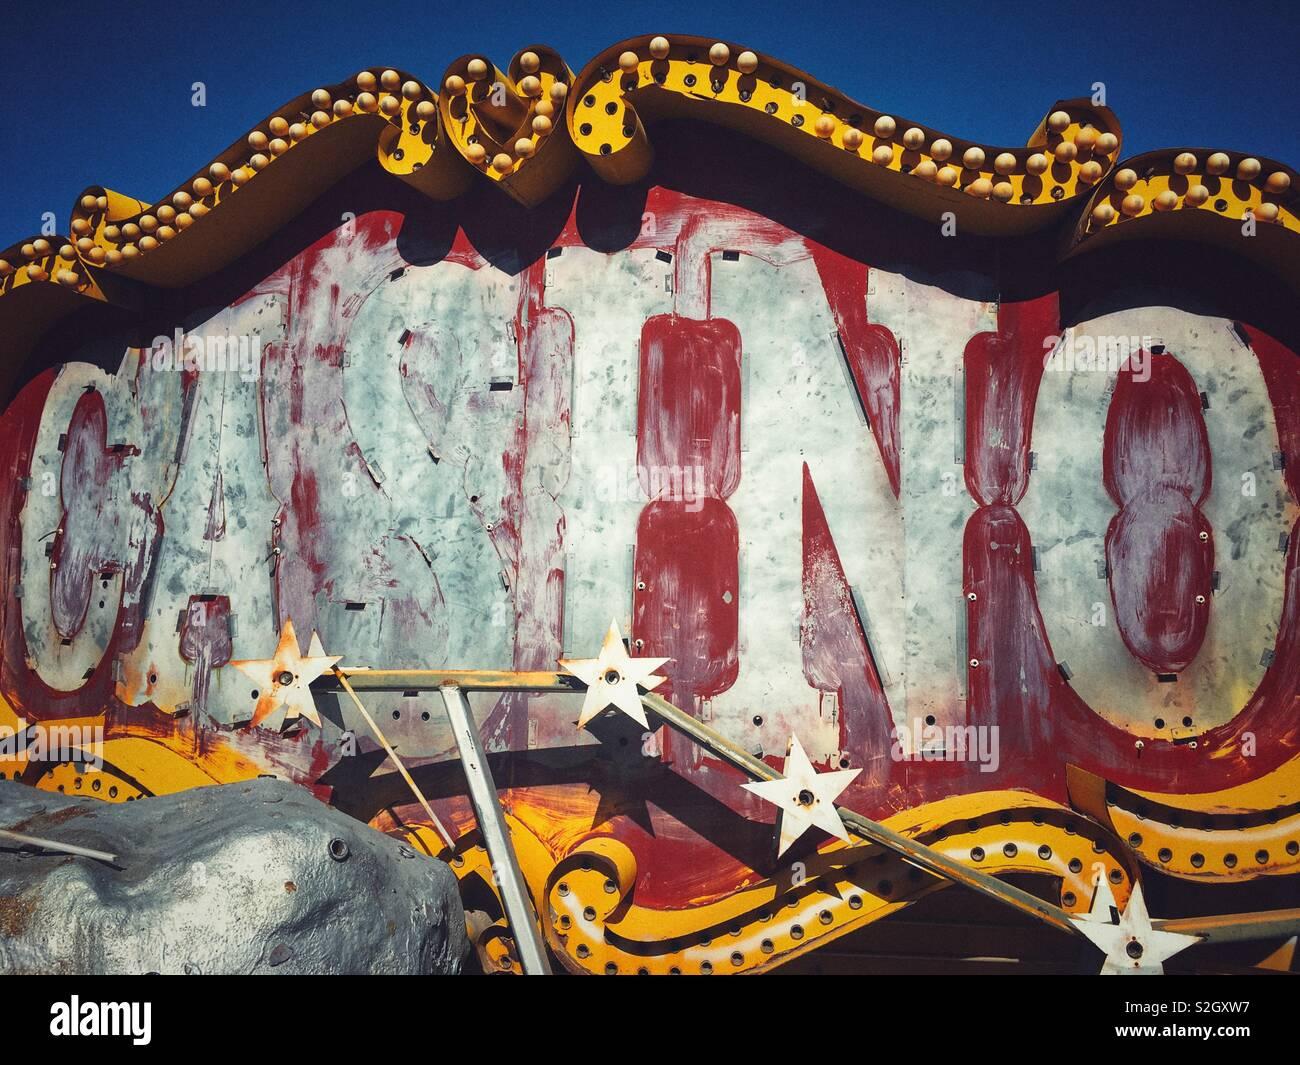 Casino signs museum aladdin casino michael moore